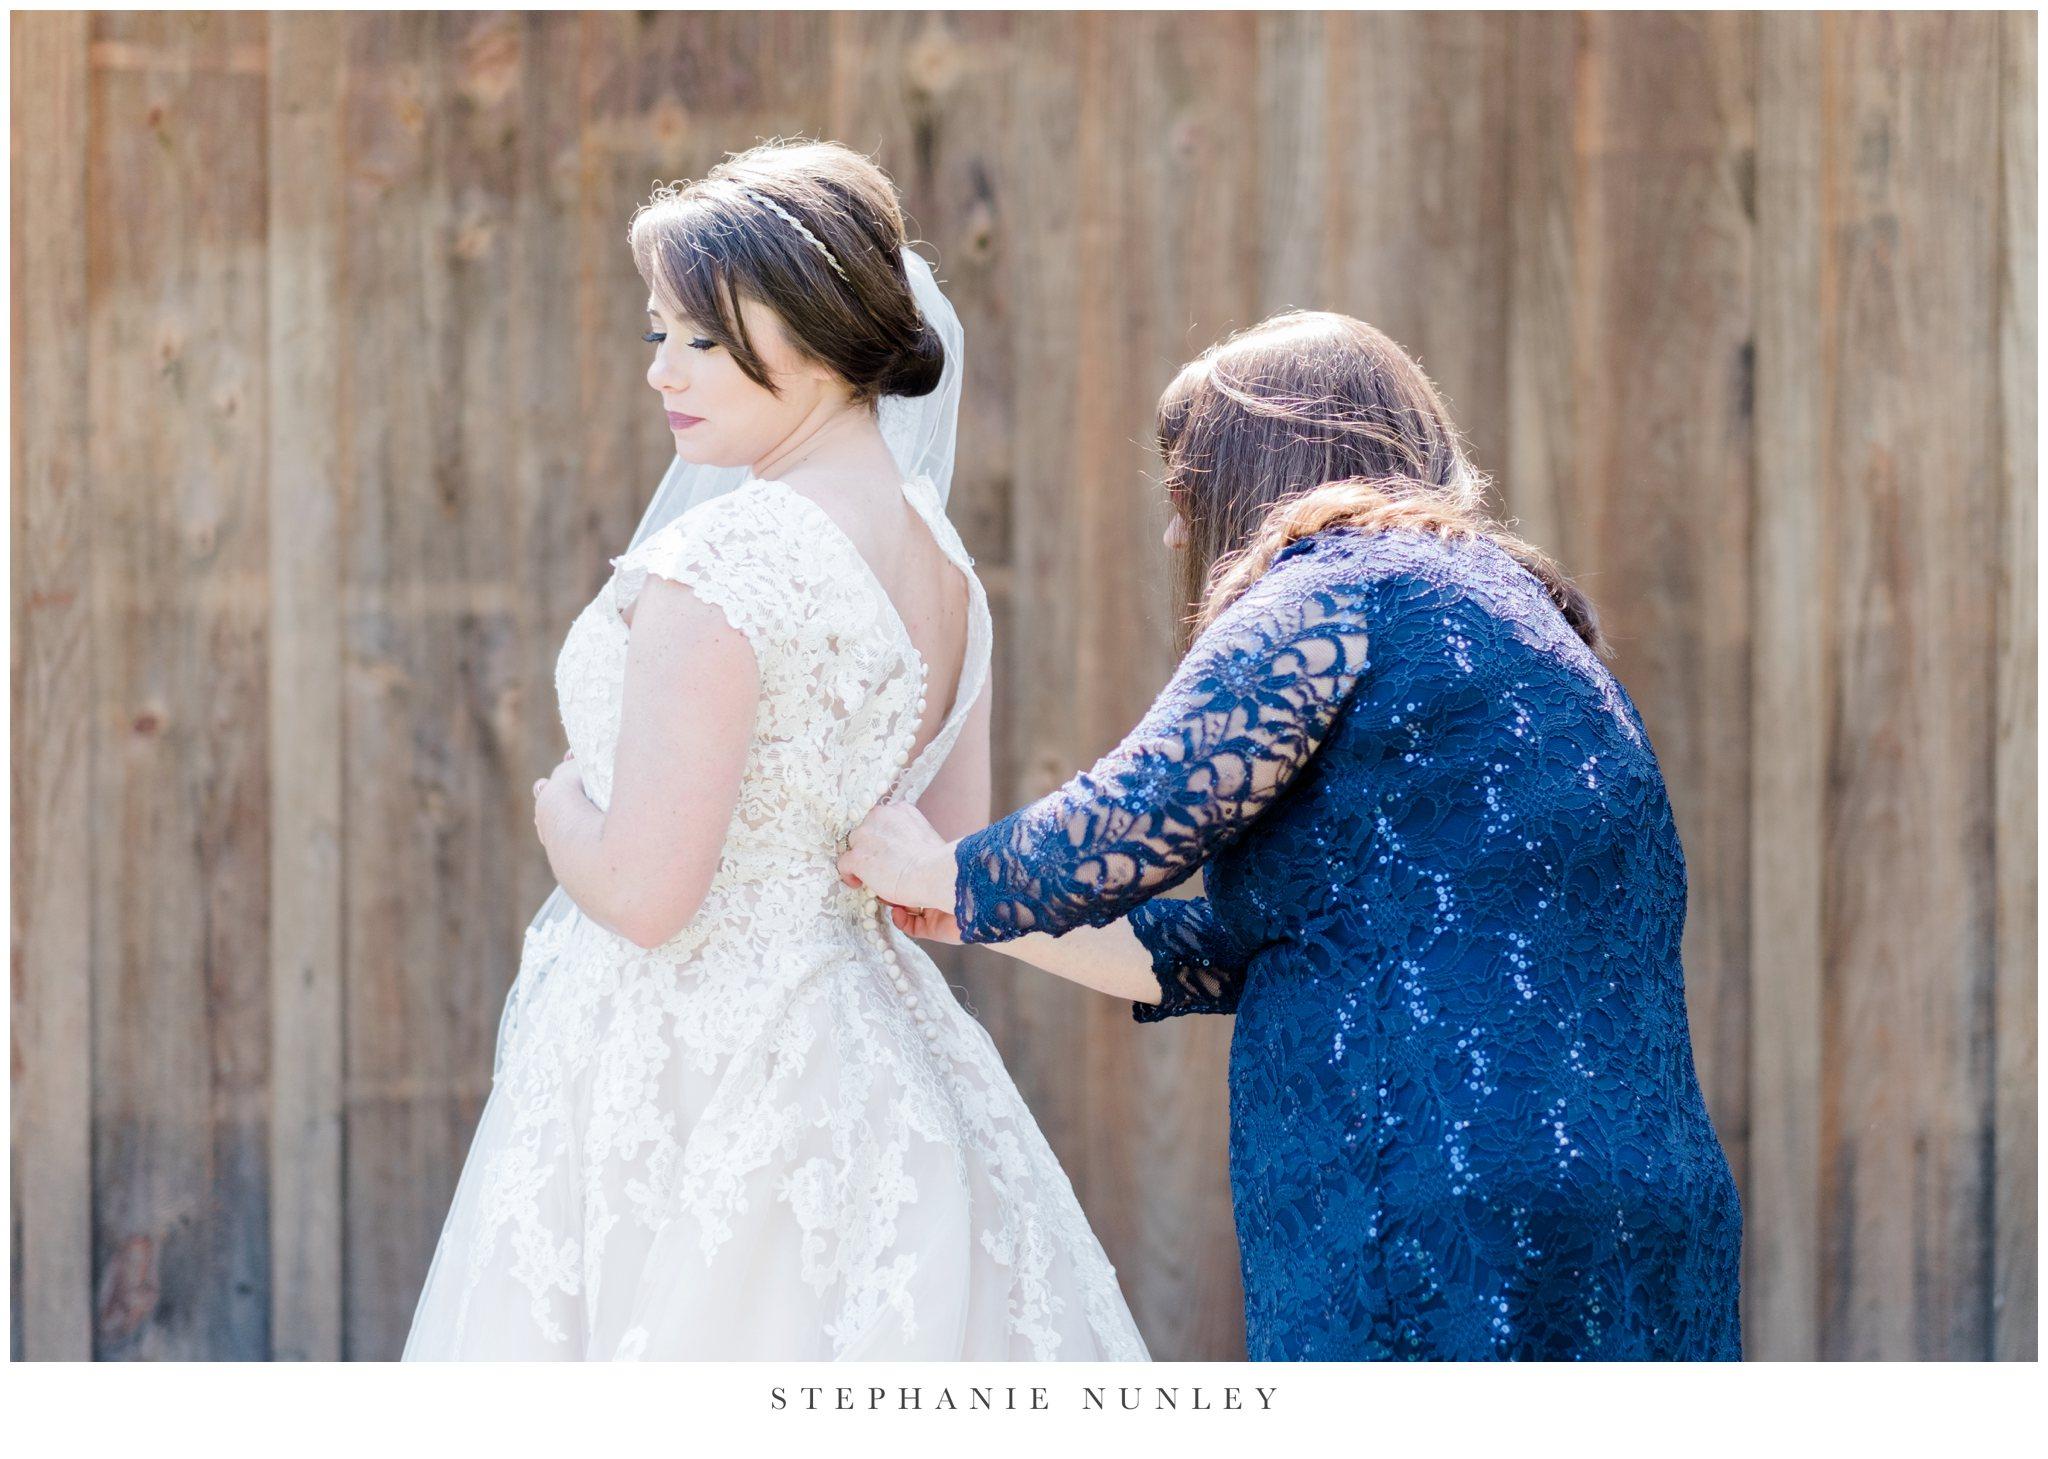 arkansas-wedding-with-lush-wildflower-bouquet-0031.jpg